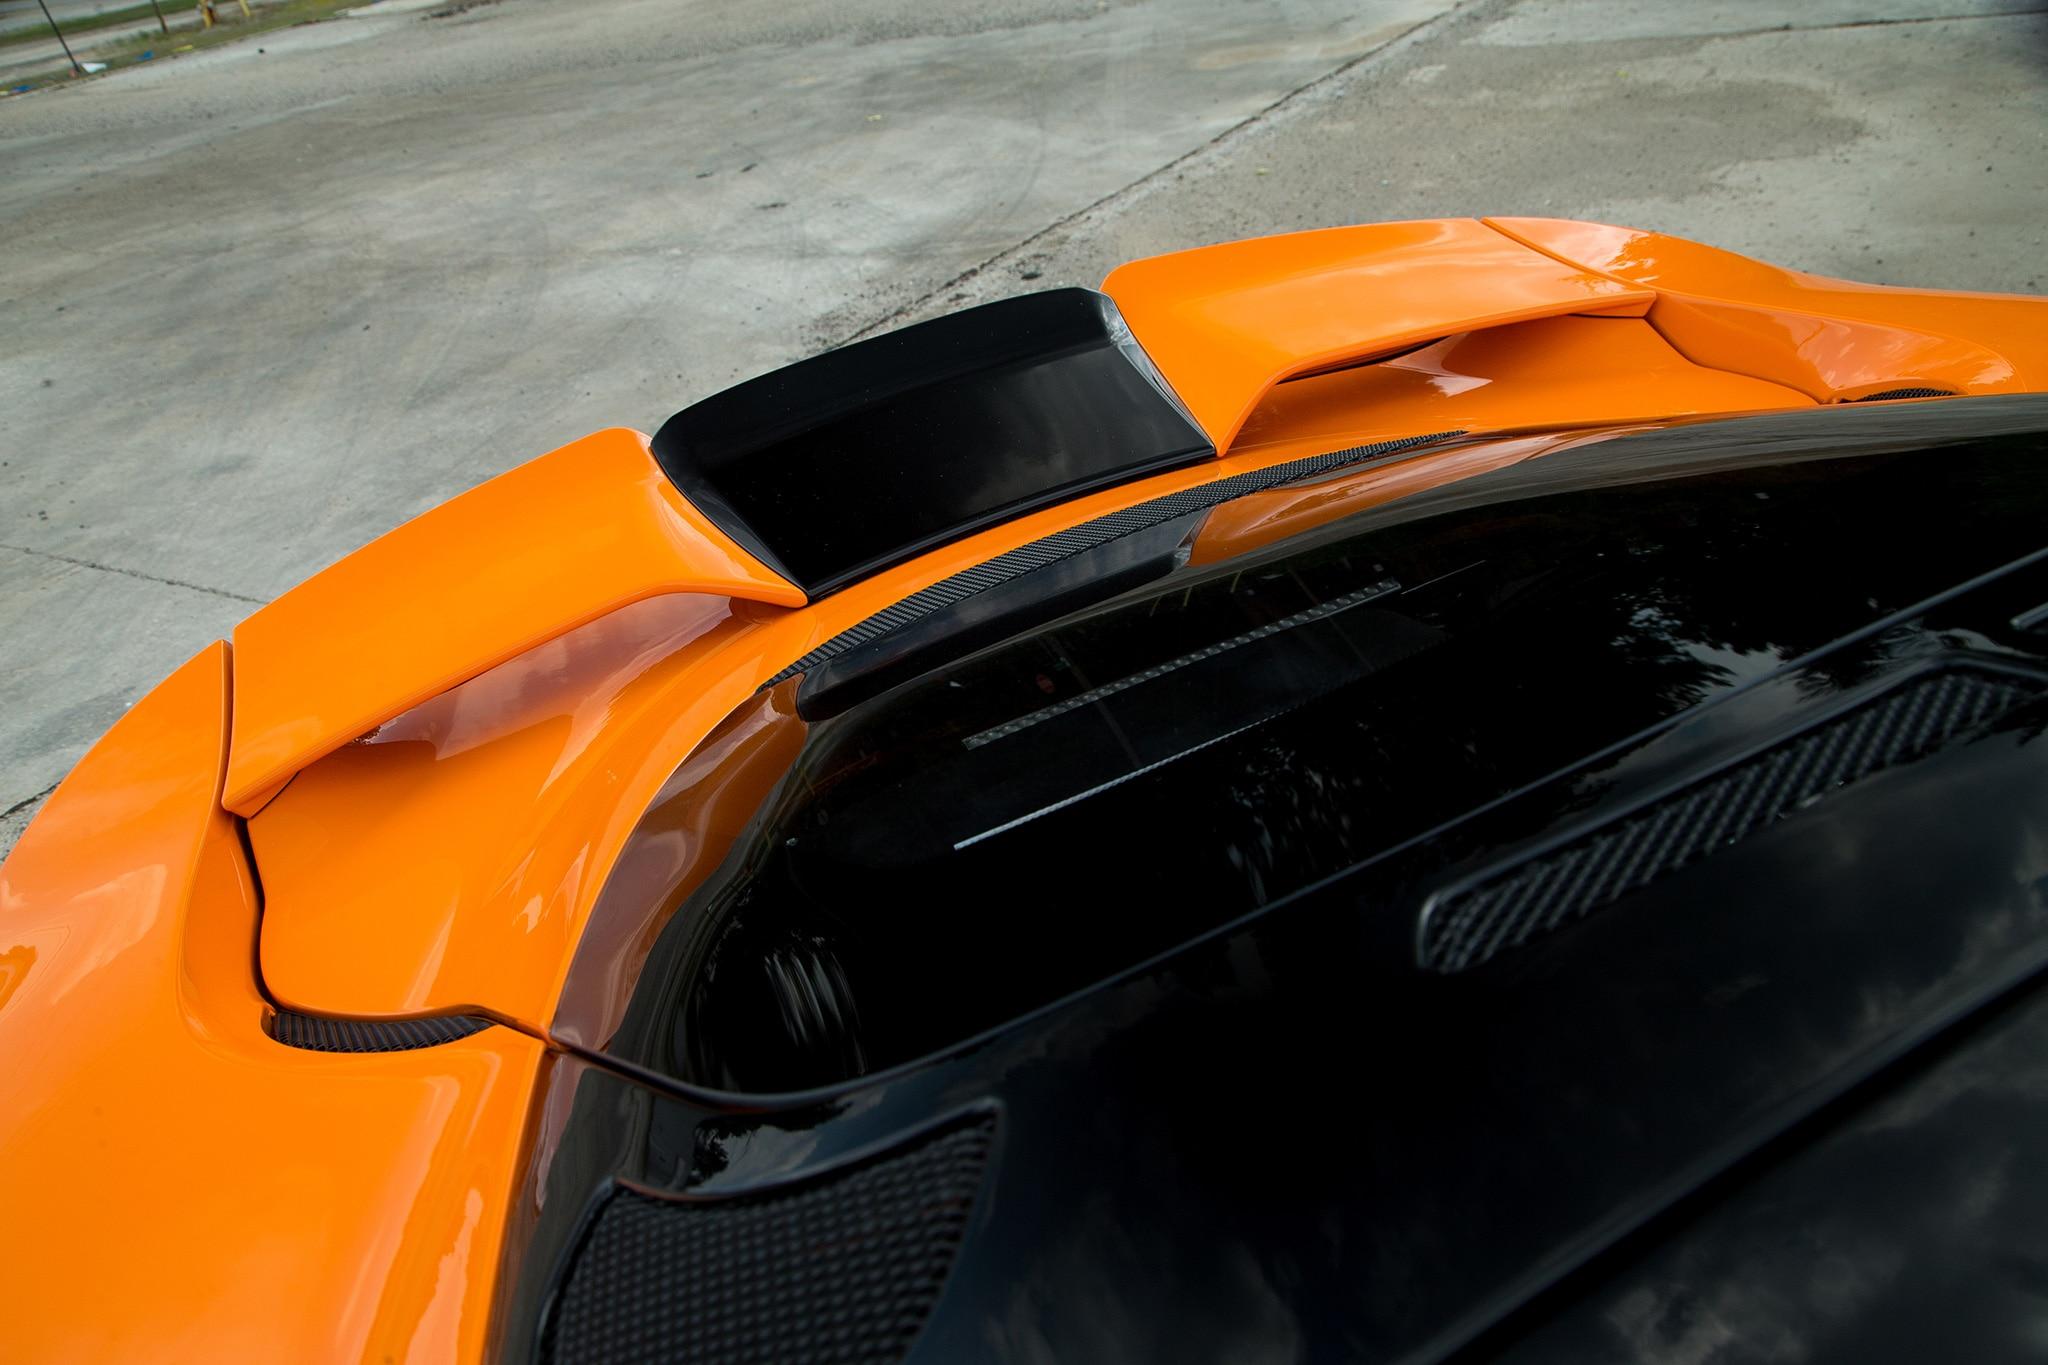 2017 Lotus Evora 400 Rear Spoiler 01